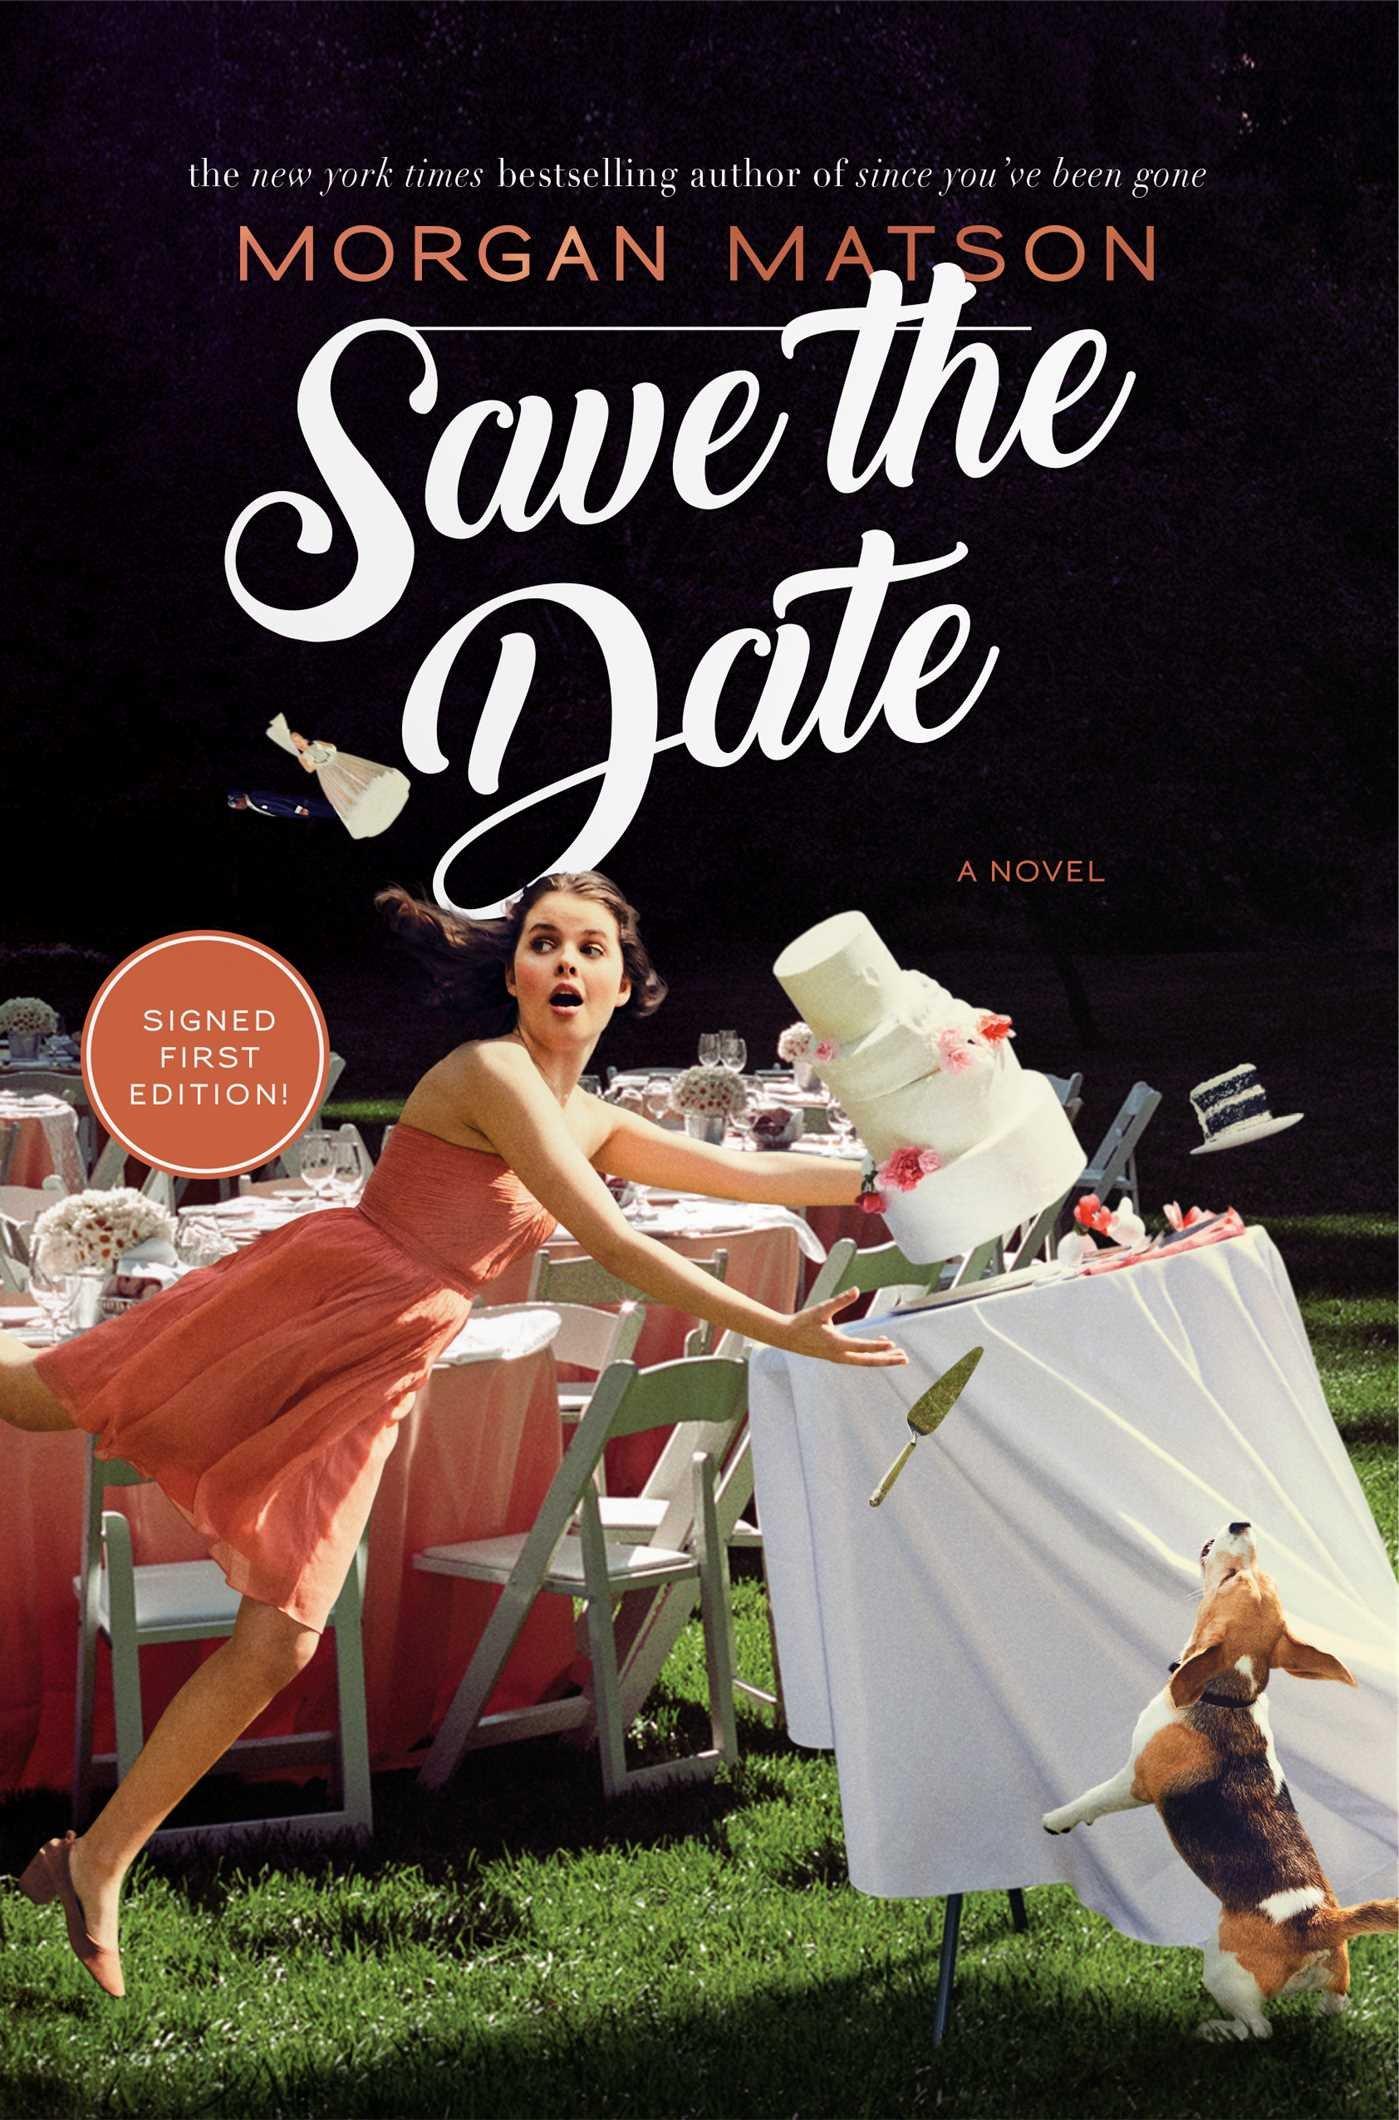 Amazon.com: Save the Date (9781481404570): Matson, Morgan: Books